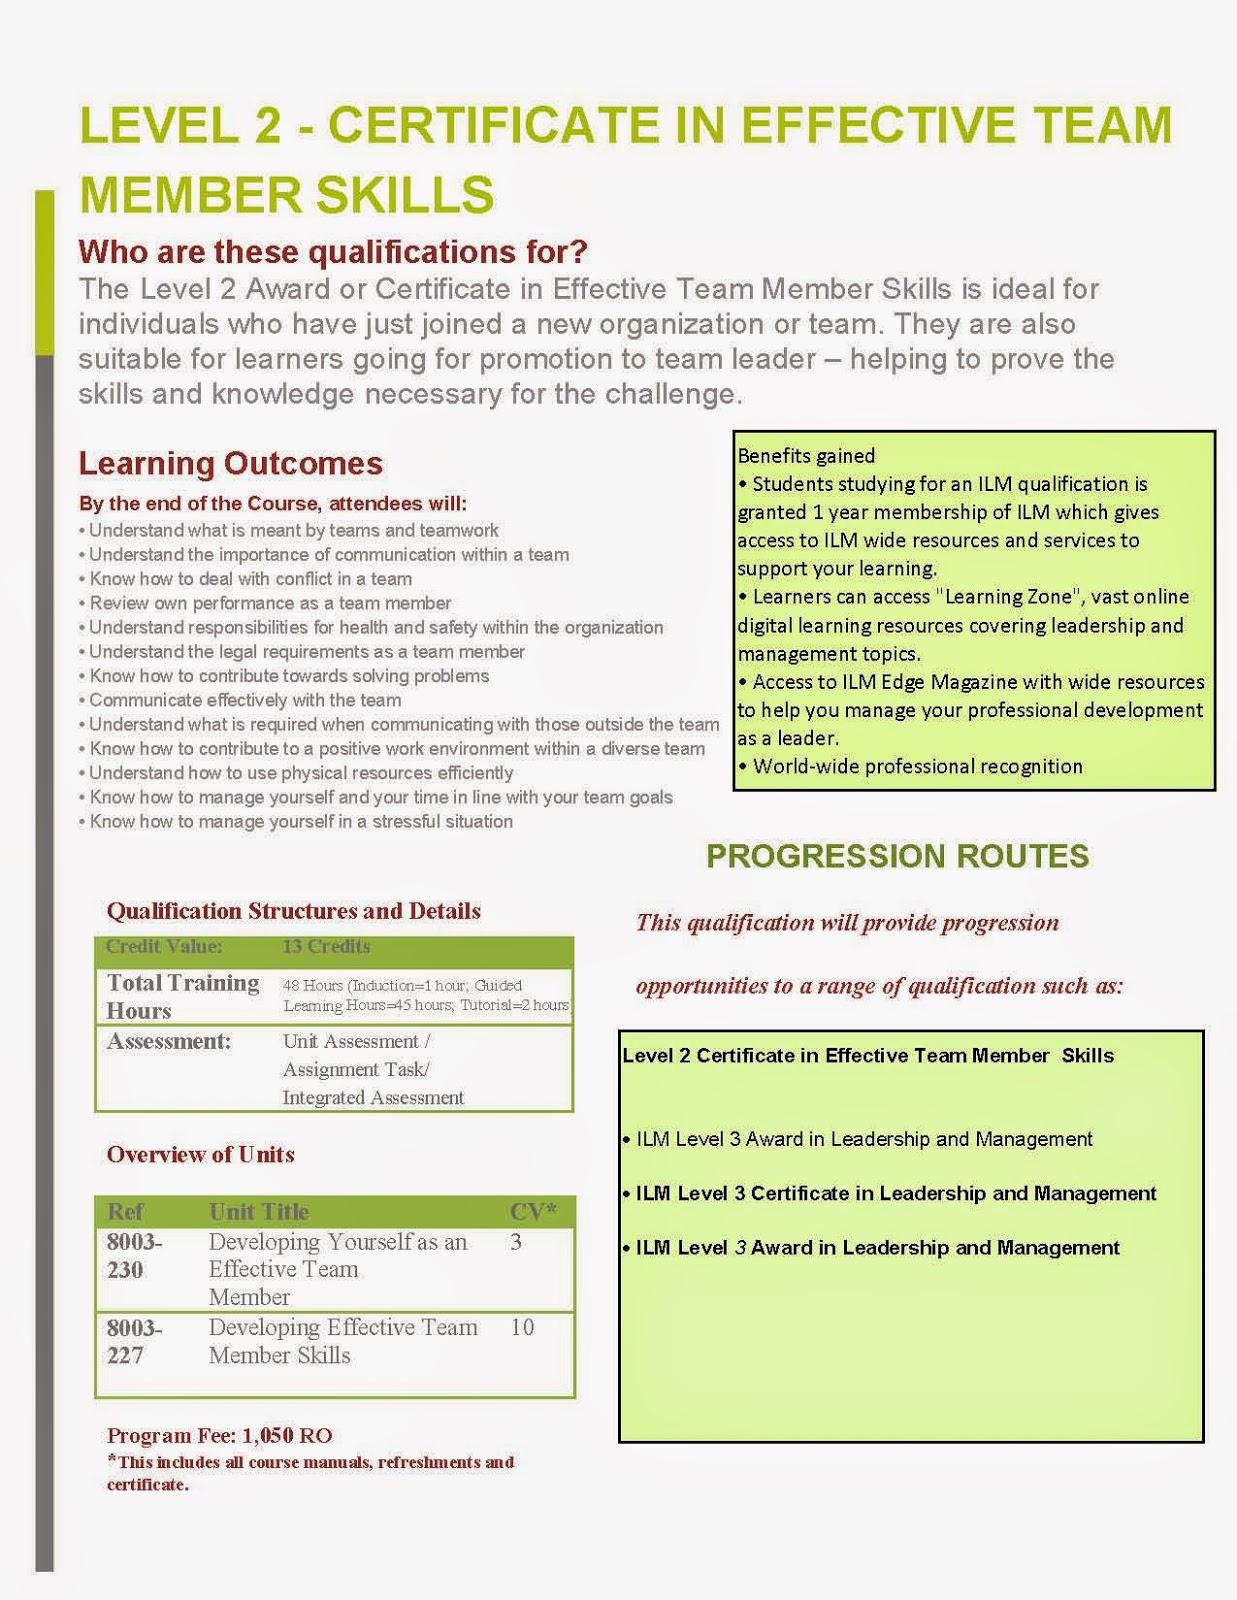 ilm leadership and management level 3